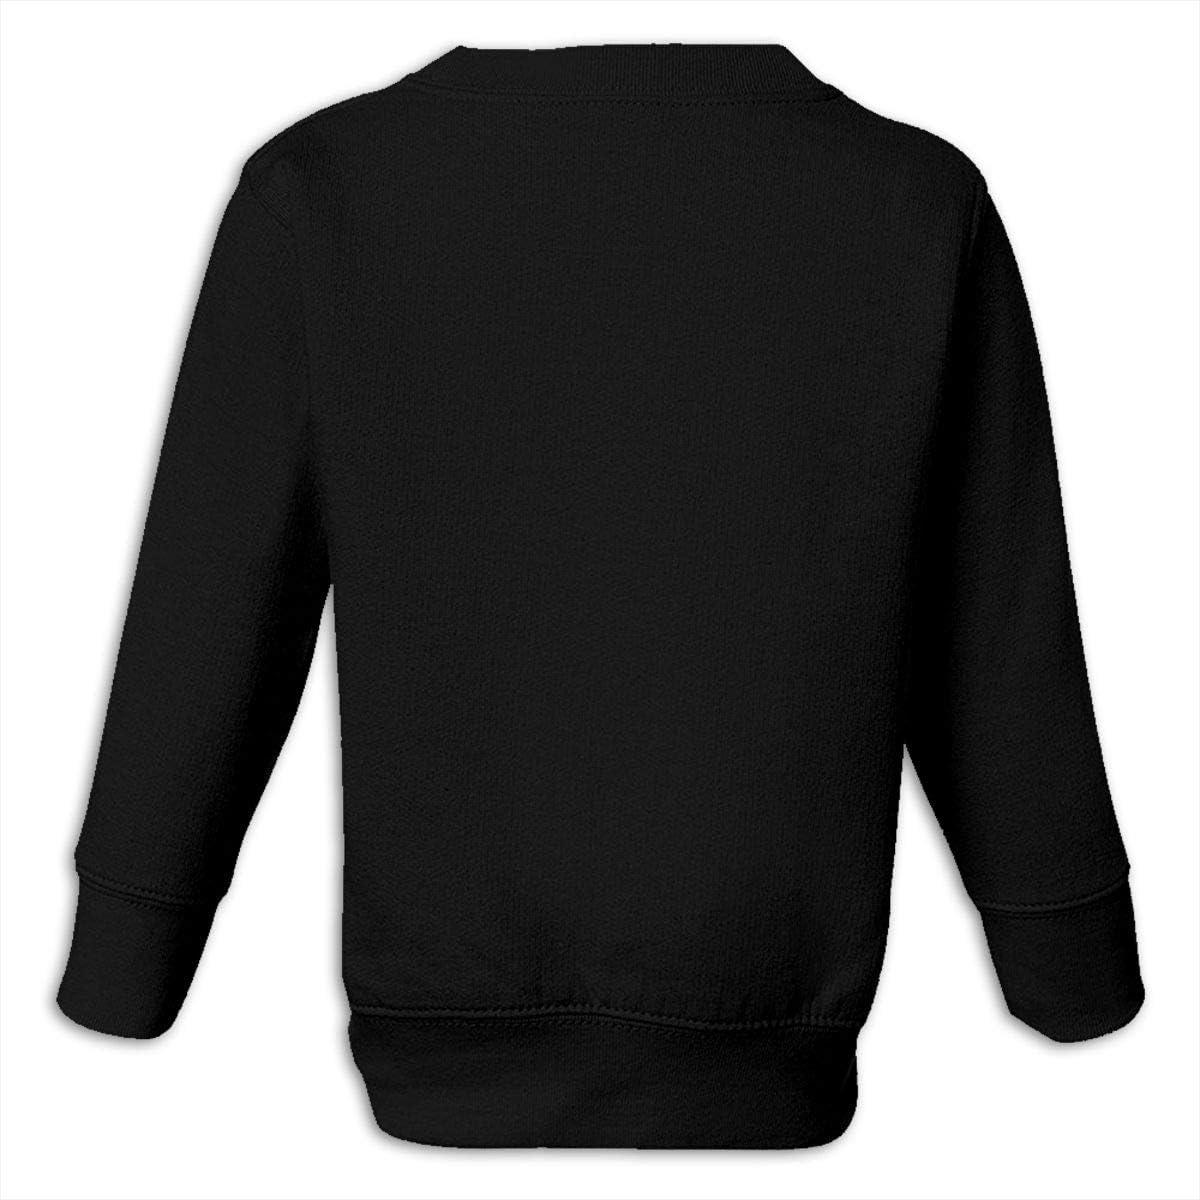 Fleece Pull Over Sweatshirt for Boys Girls Kids Youth Lion Unisex Toddler Hoodies